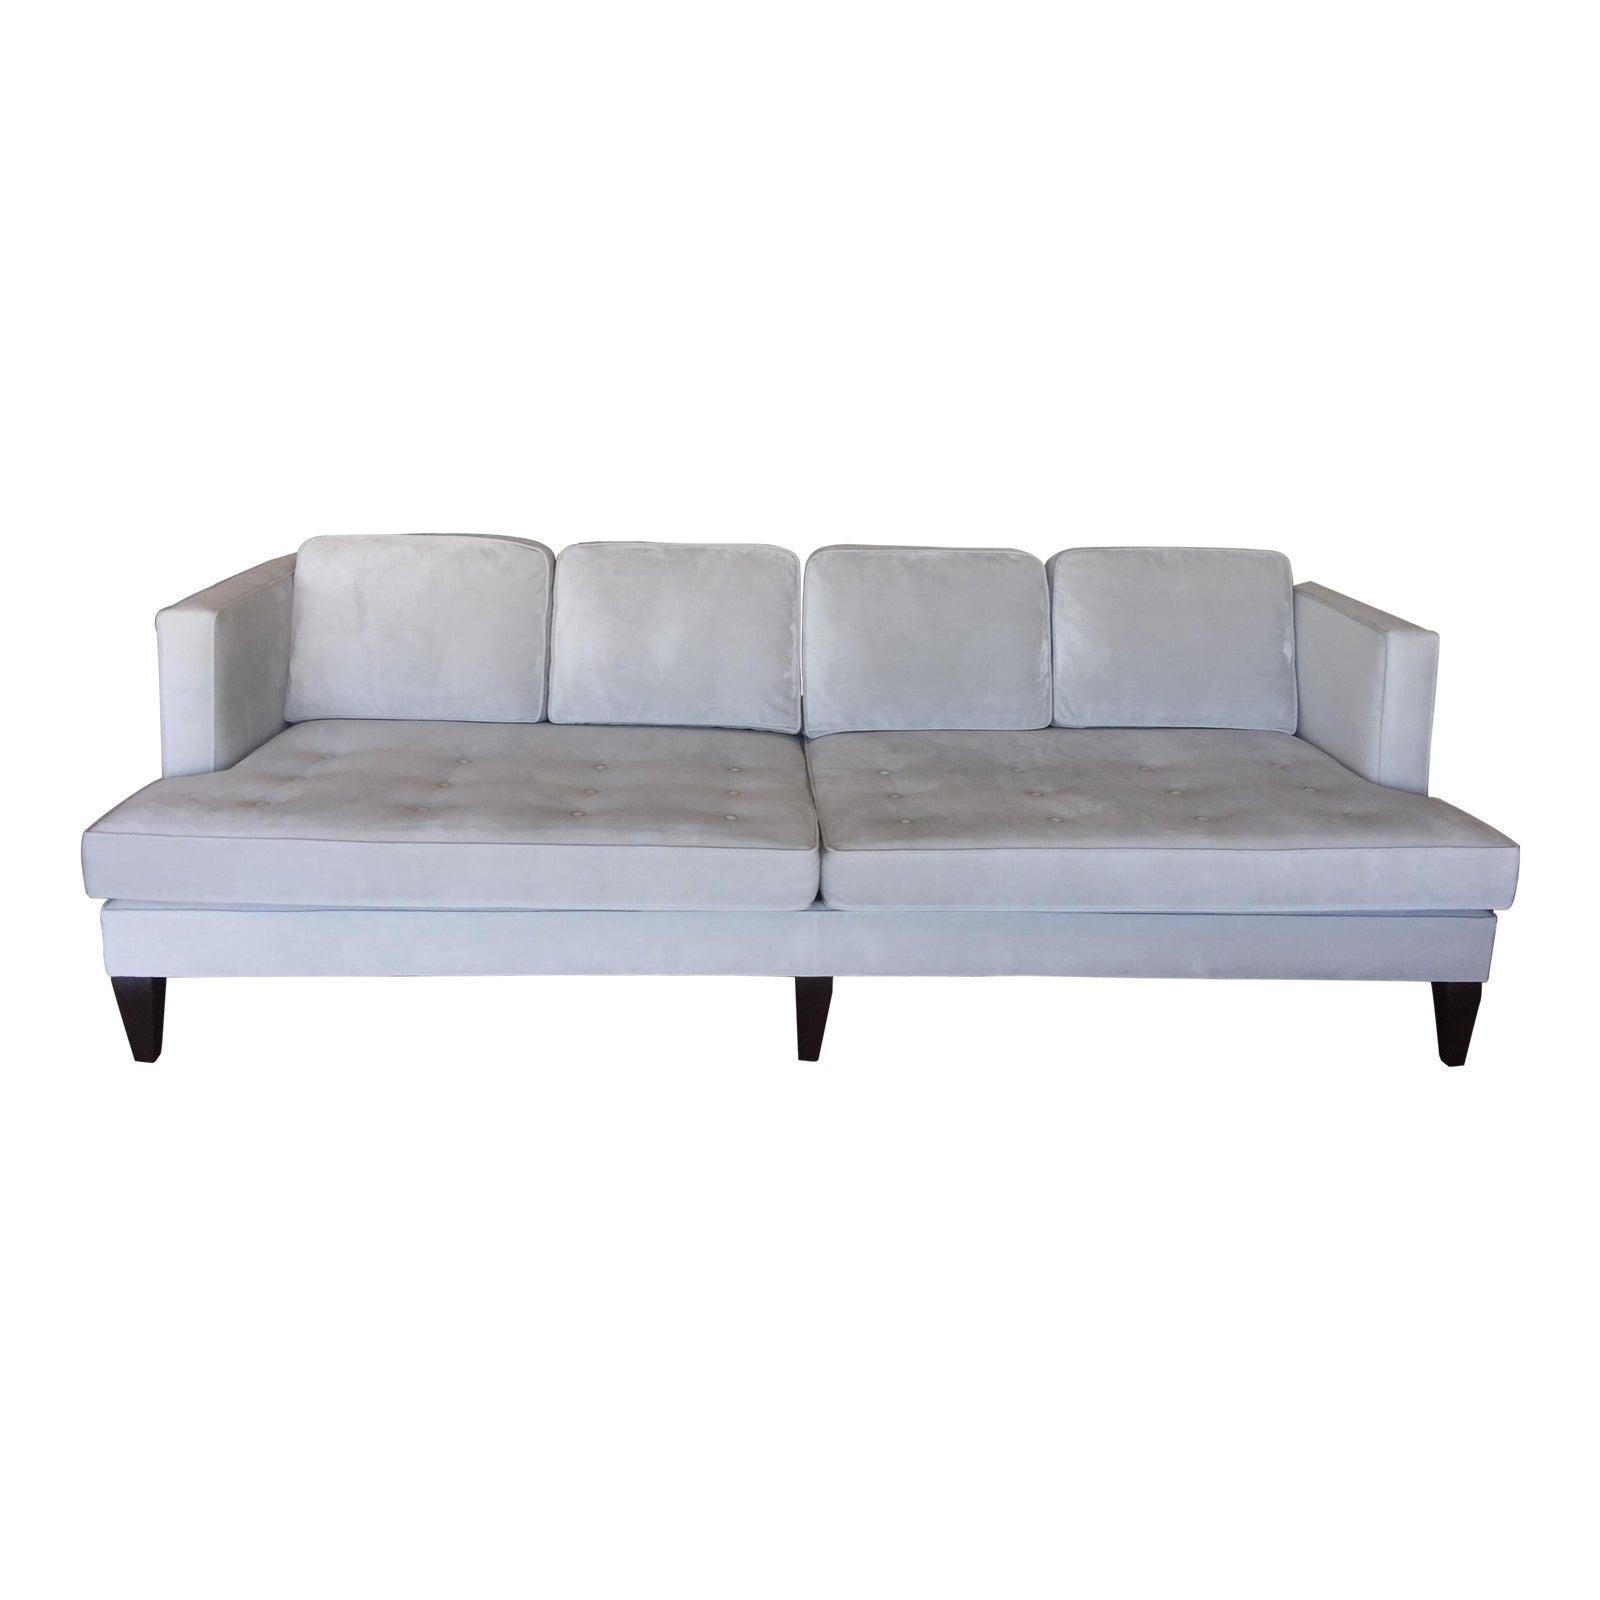 Room hutton sofa chairish